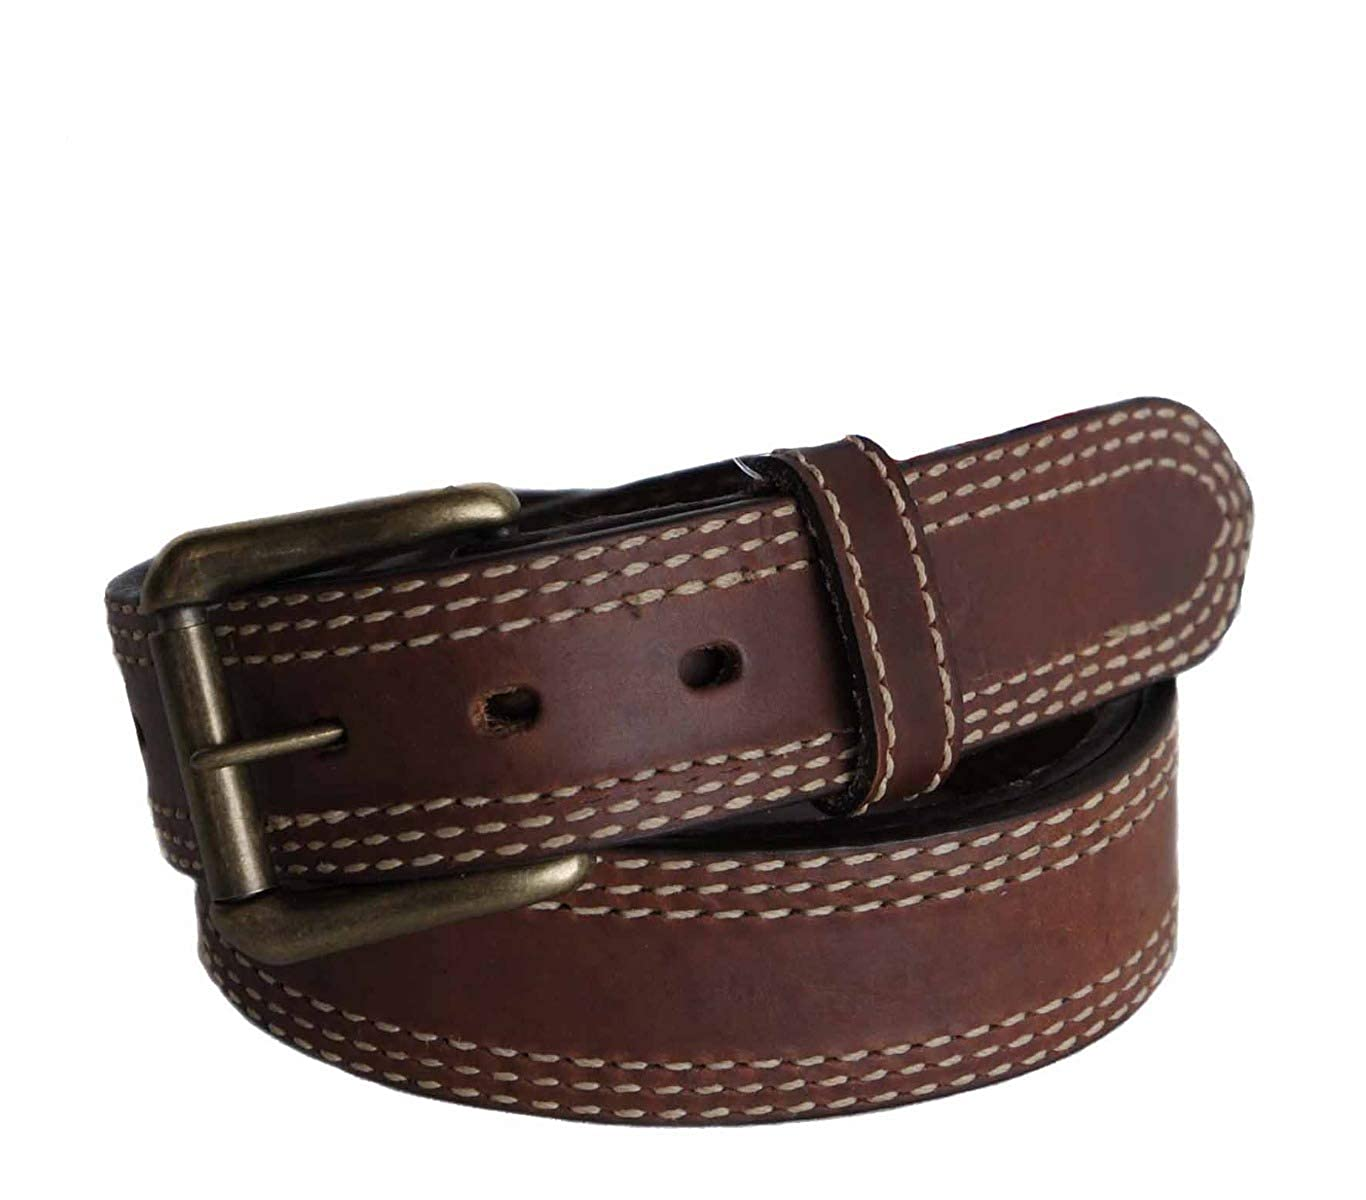 ad38621af995 R bullco usa made jpg 1366x1200 Police belts tan oil